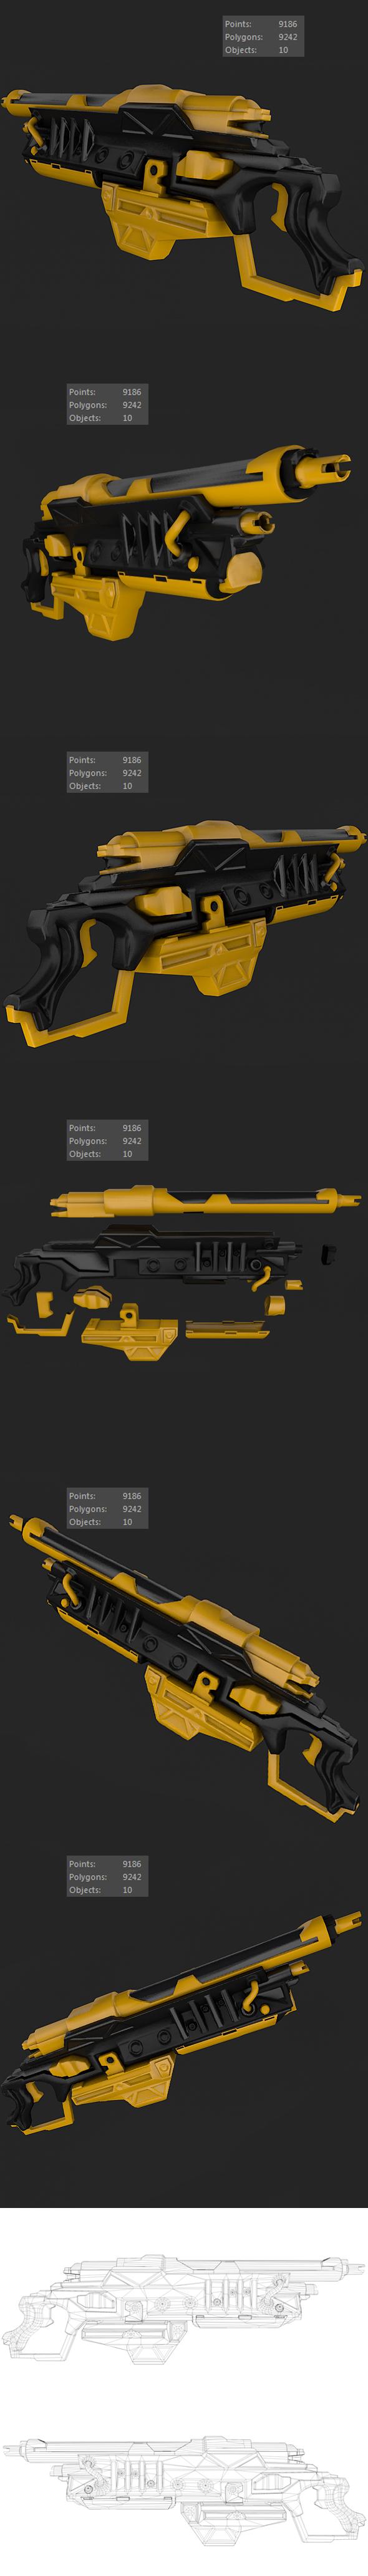 Sci-Fi Gun 01 - 3DOcean Item for Sale